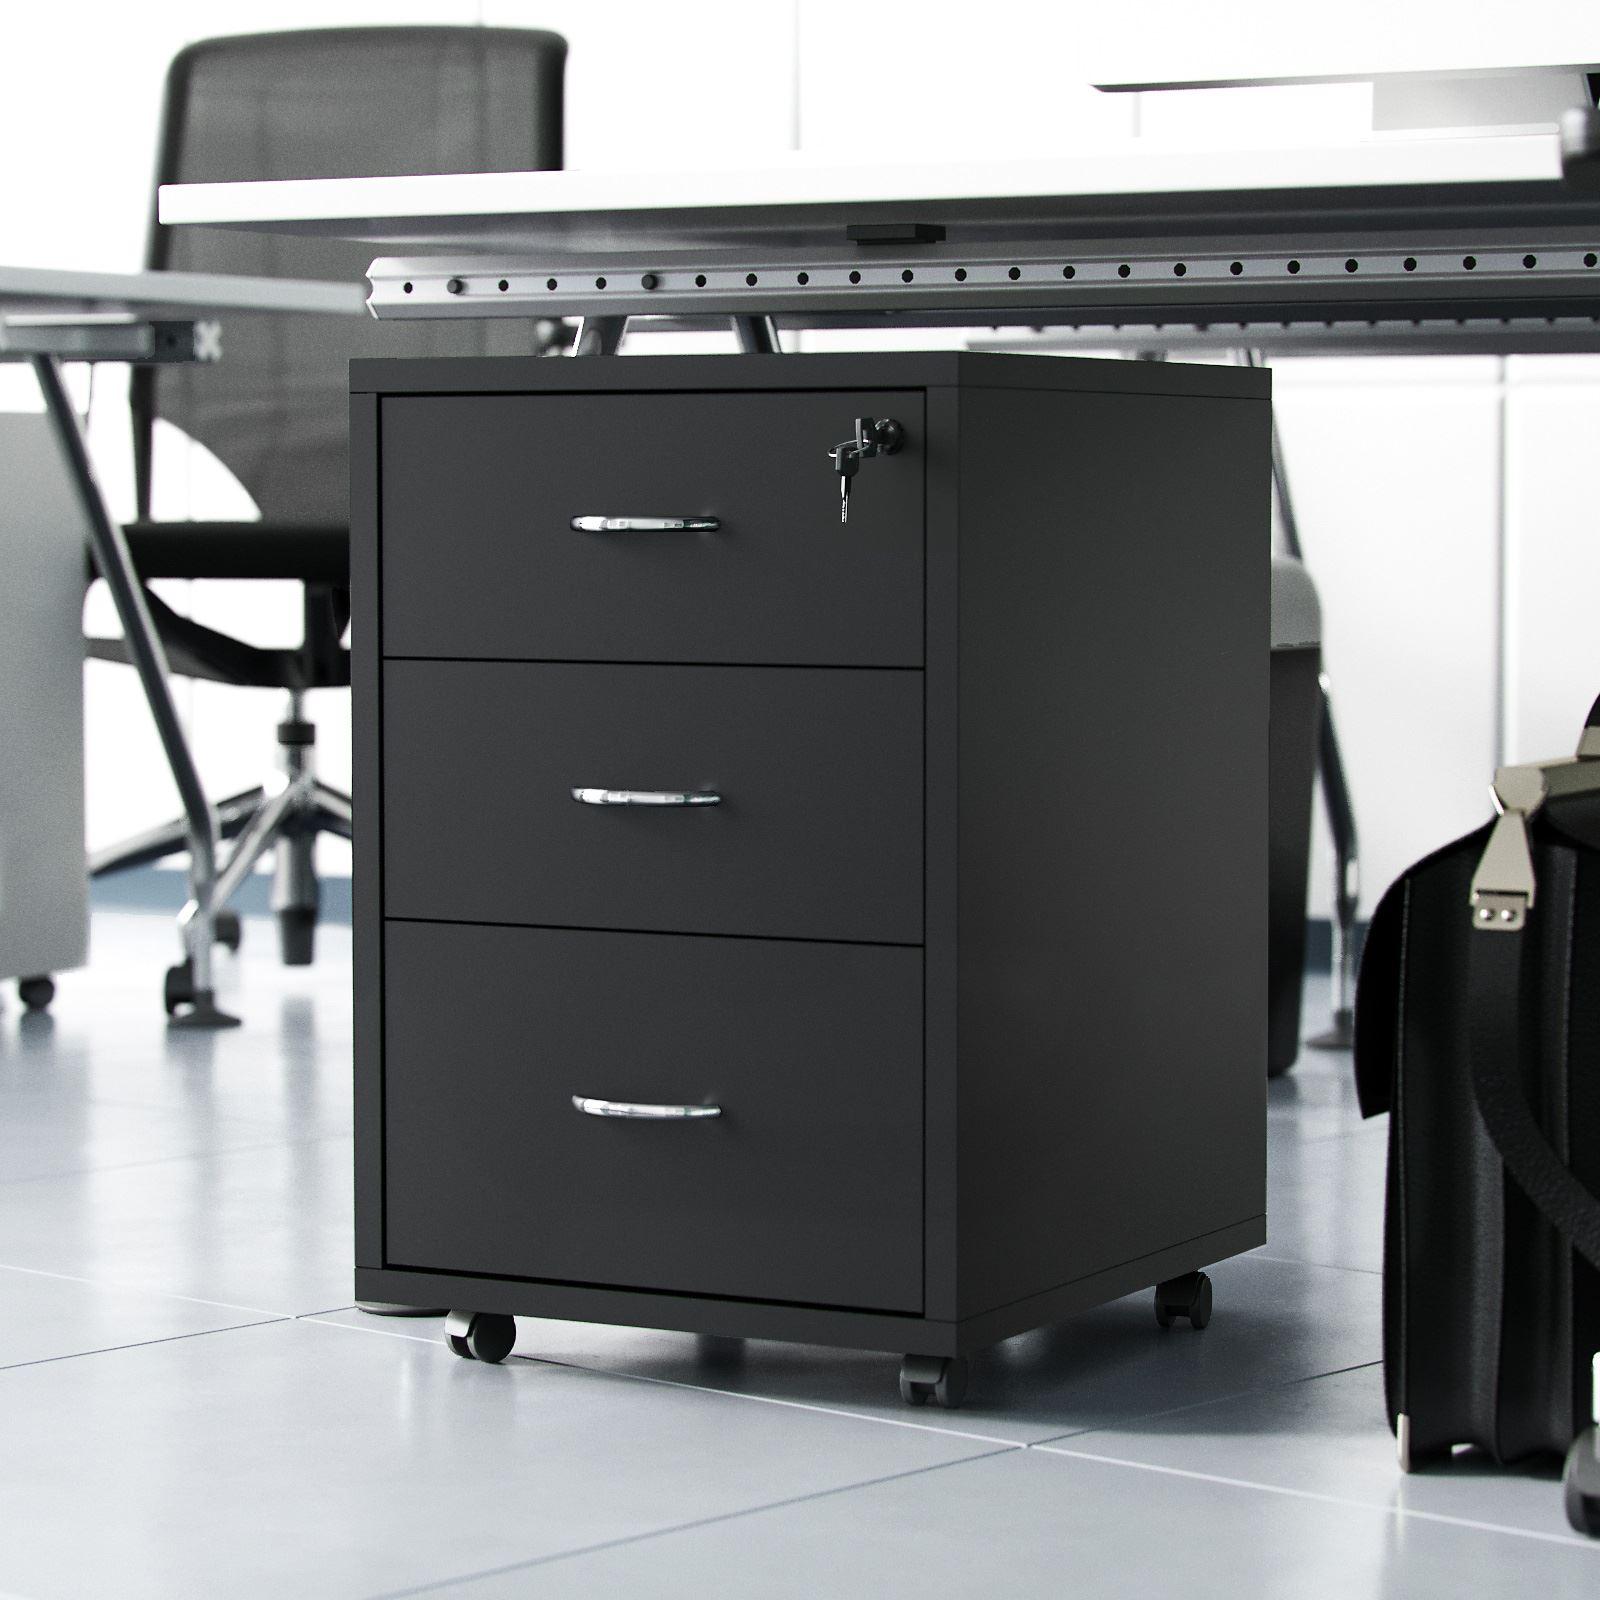 Remarkable Details About Filing Black Pedestal Under Desk Counter Office Cabinet 3 Drawers Lockable Chest Download Free Architecture Designs Embacsunscenecom